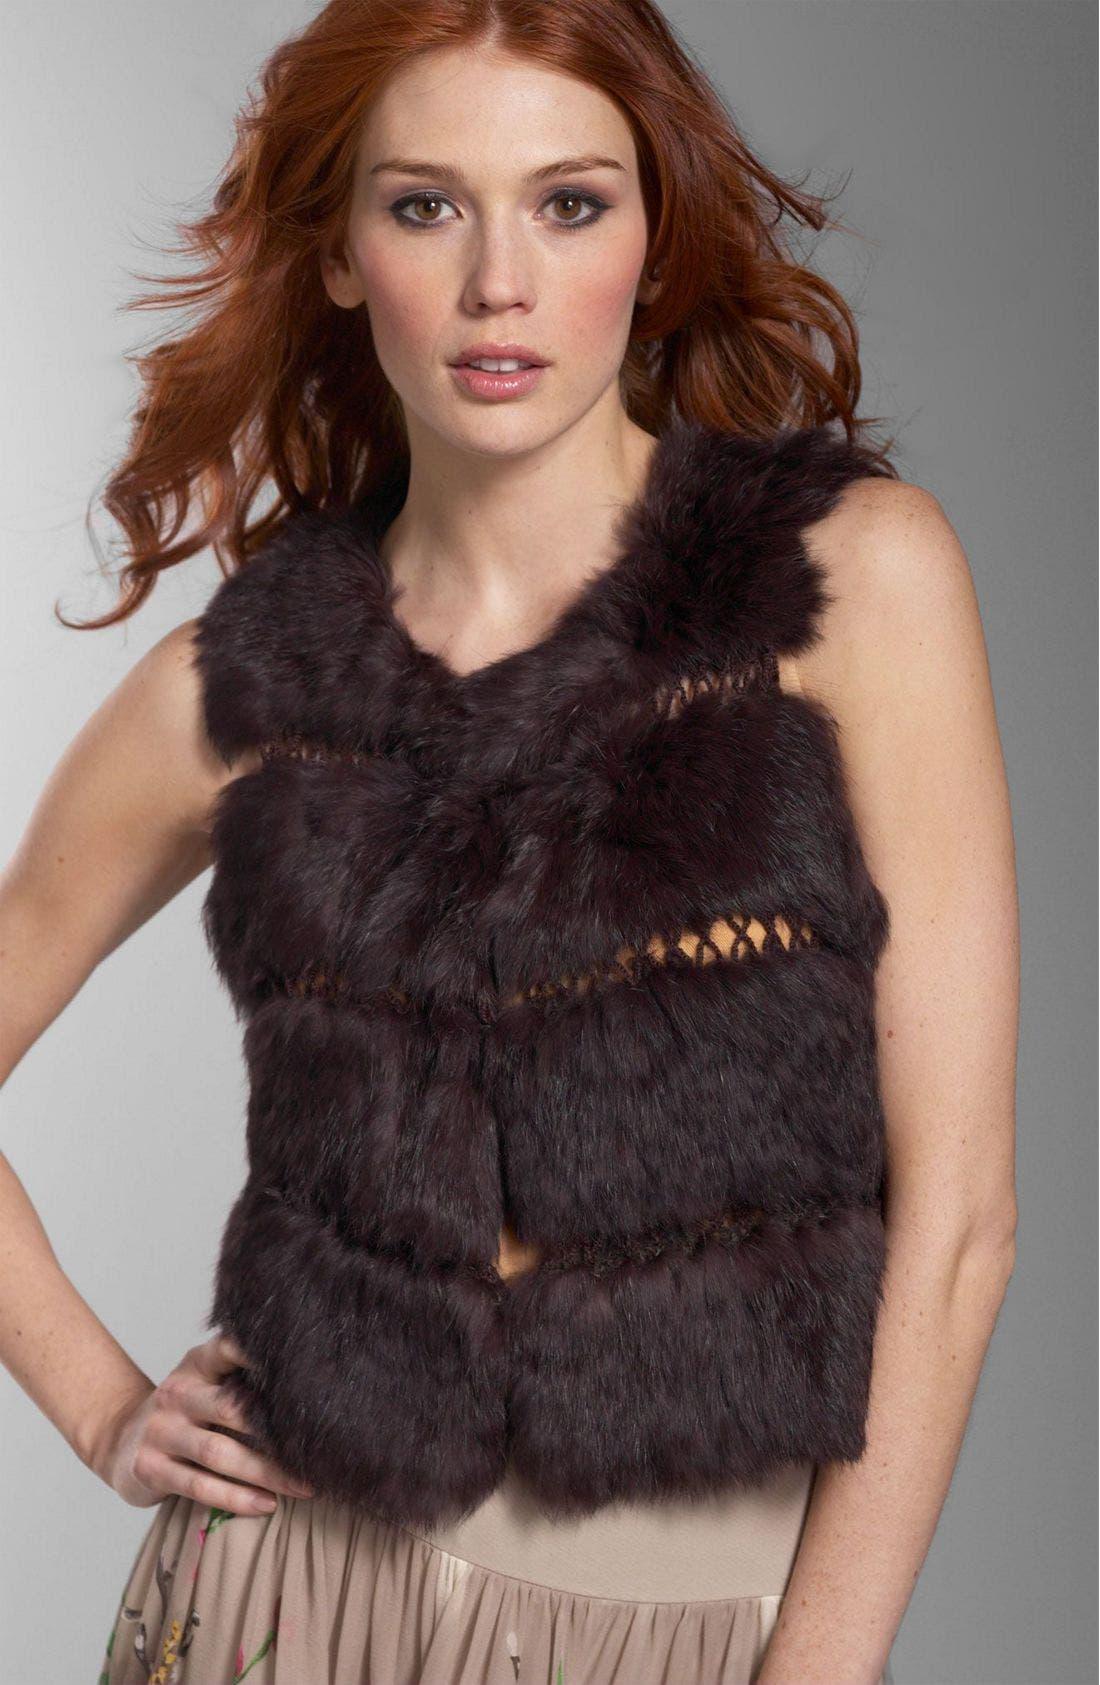 BCBG Max Azria Fur Vest,                             Main thumbnail 1, color,                             BLK